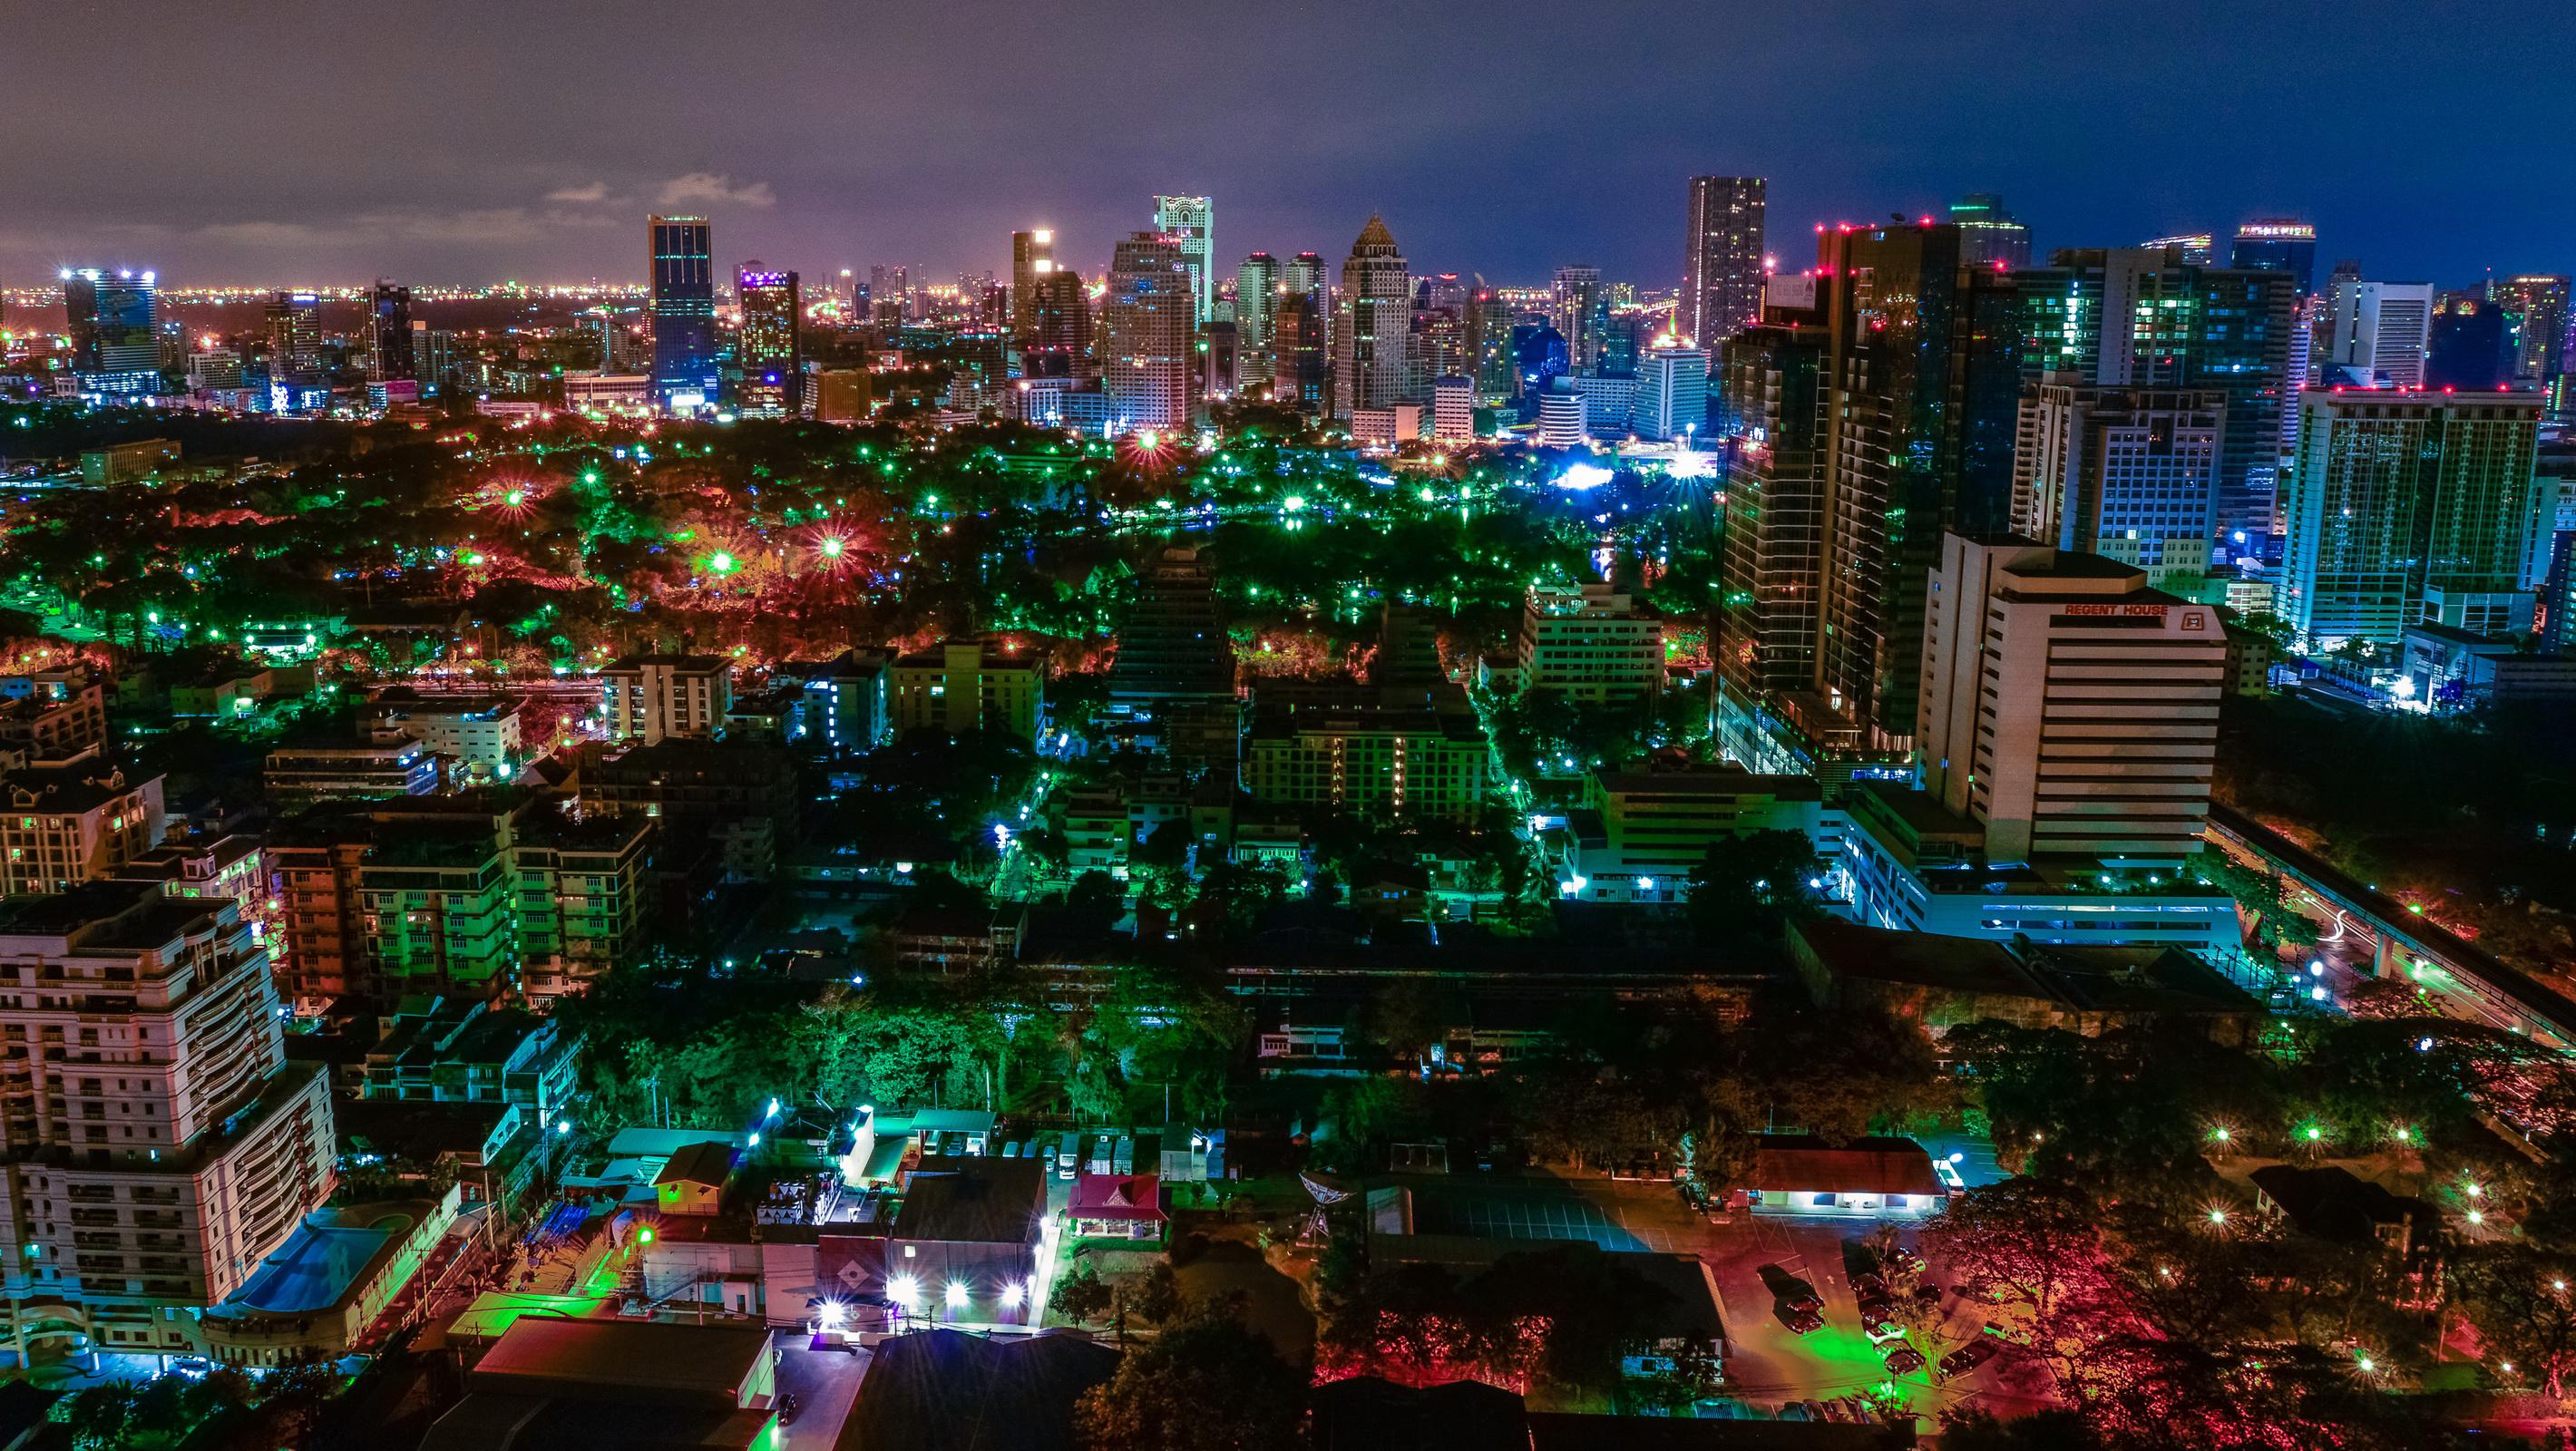 страны архитектура Бангкок Таиланд ночь  № 2195132 загрузить